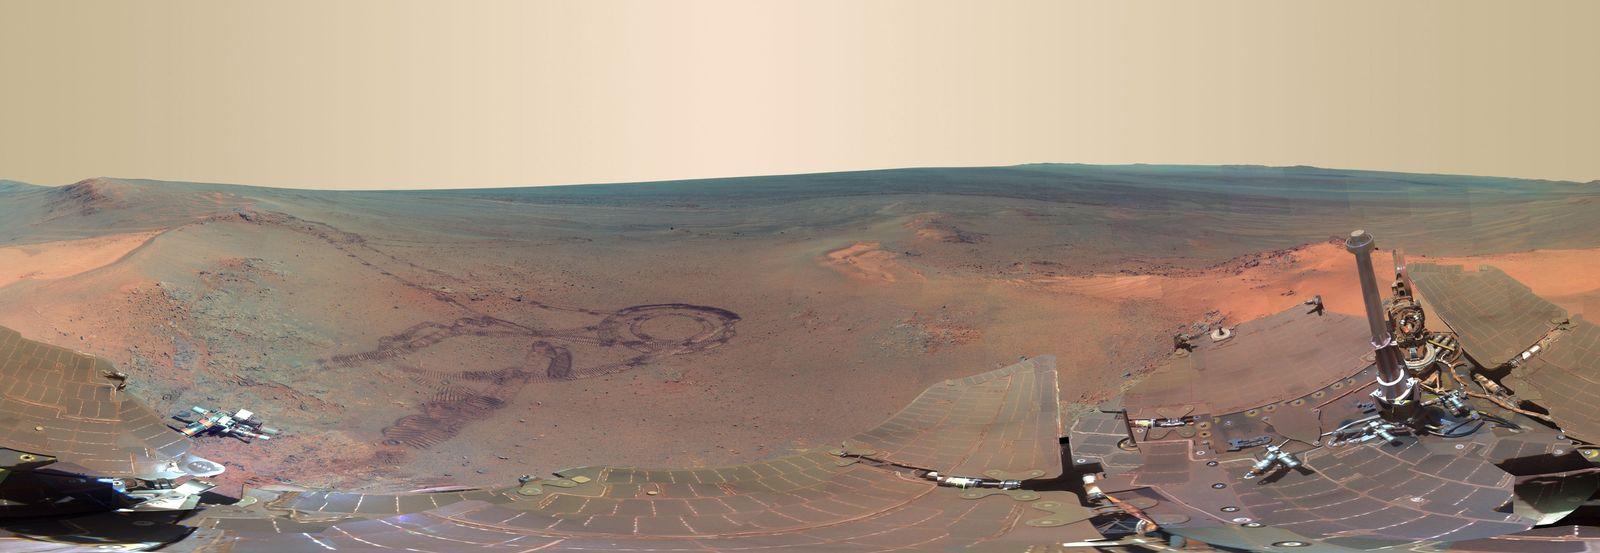 Mars / Opportunity